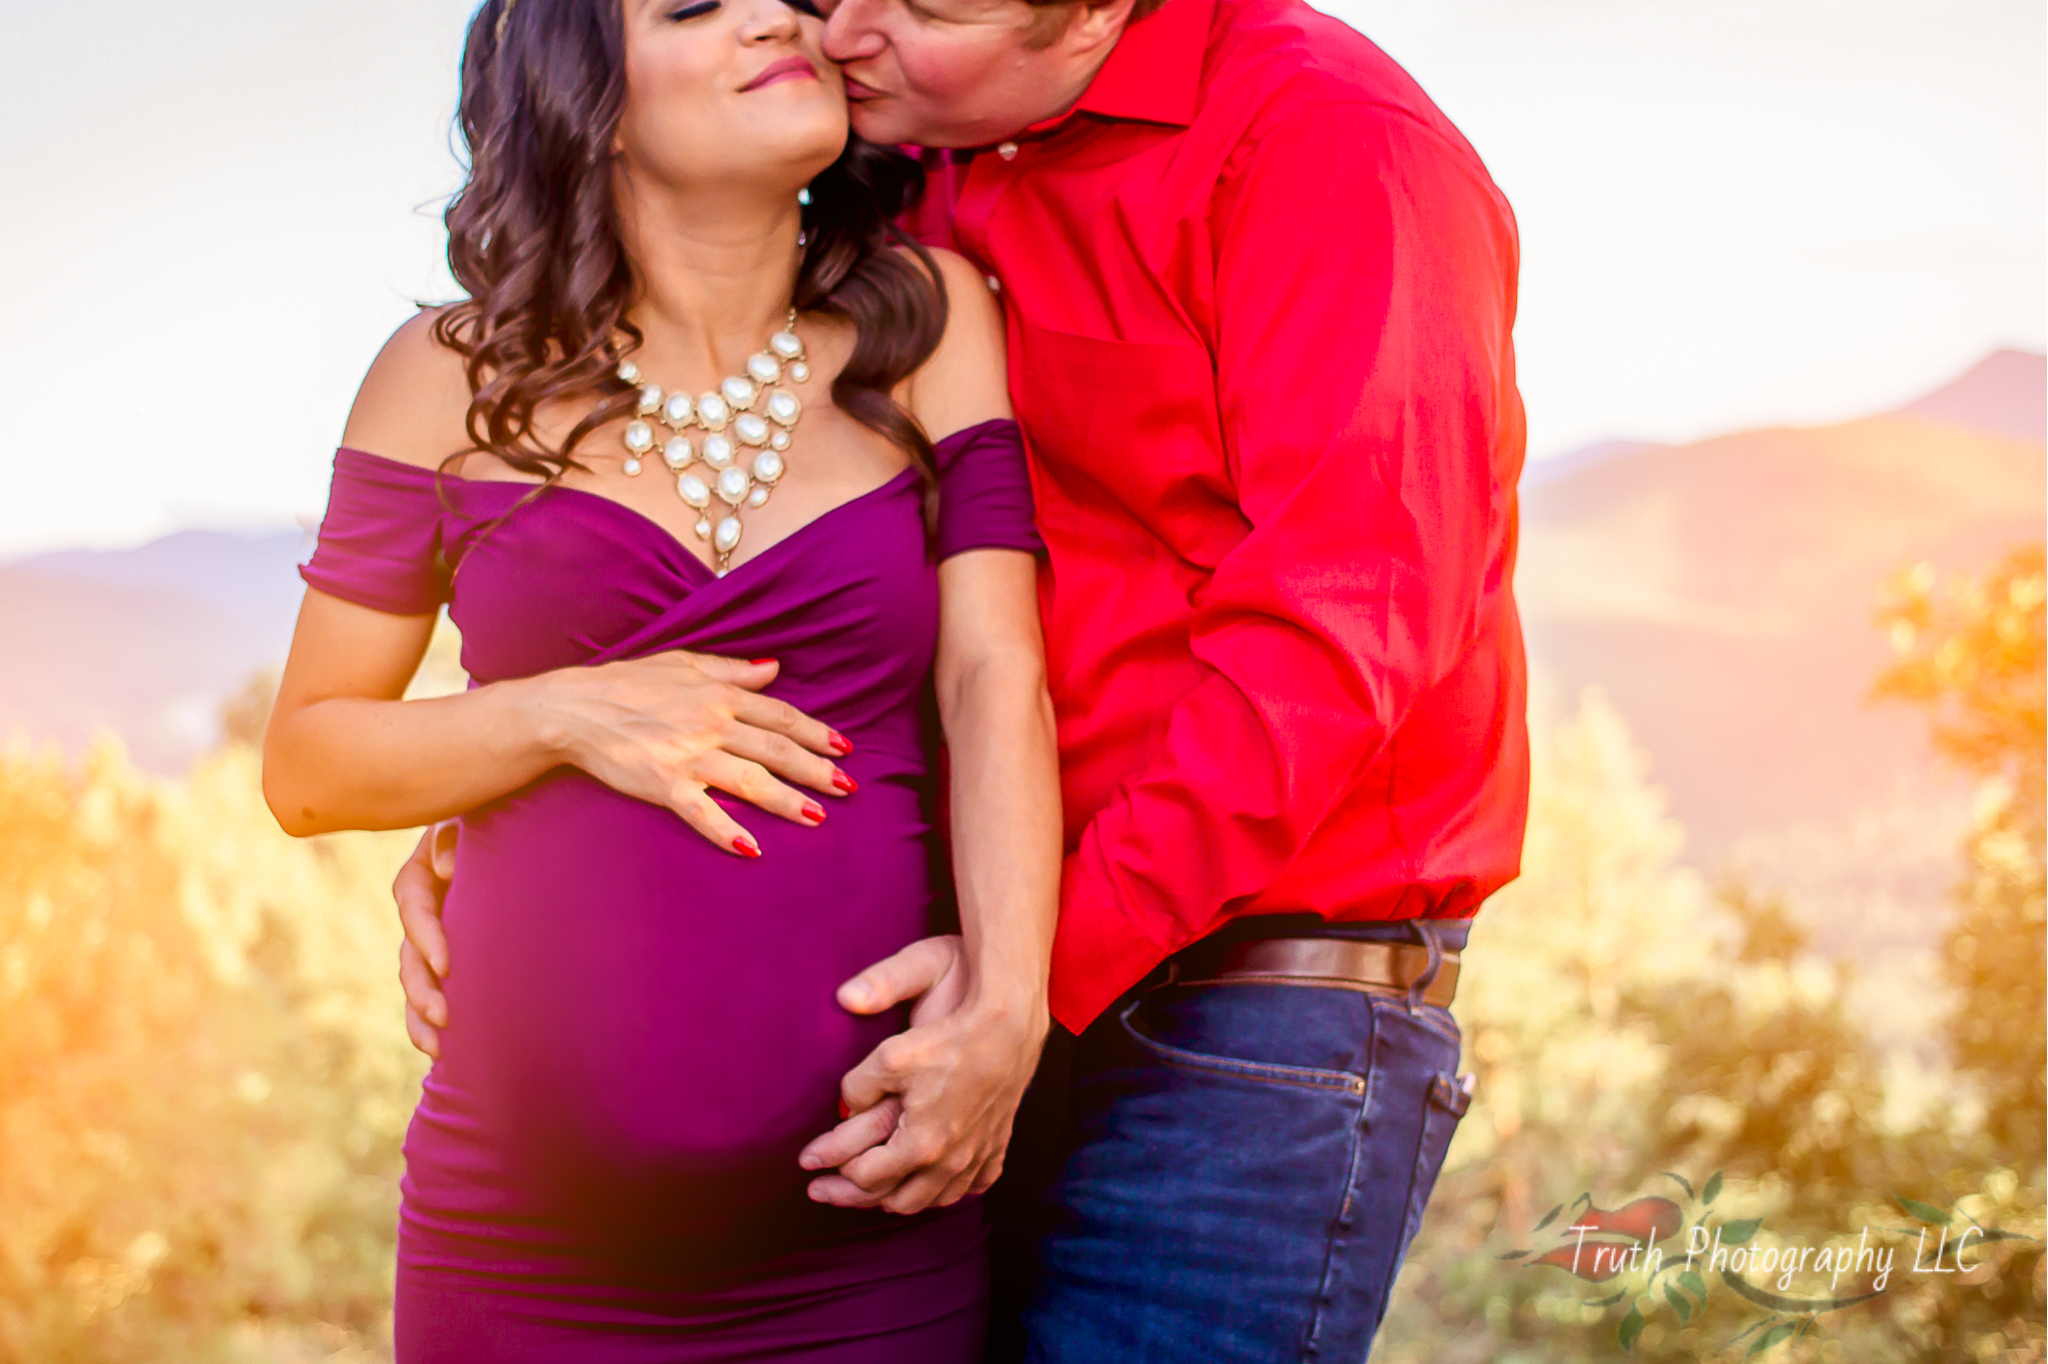 Truth-Photography-Morrison-Co-Maternity-photographs.jpg